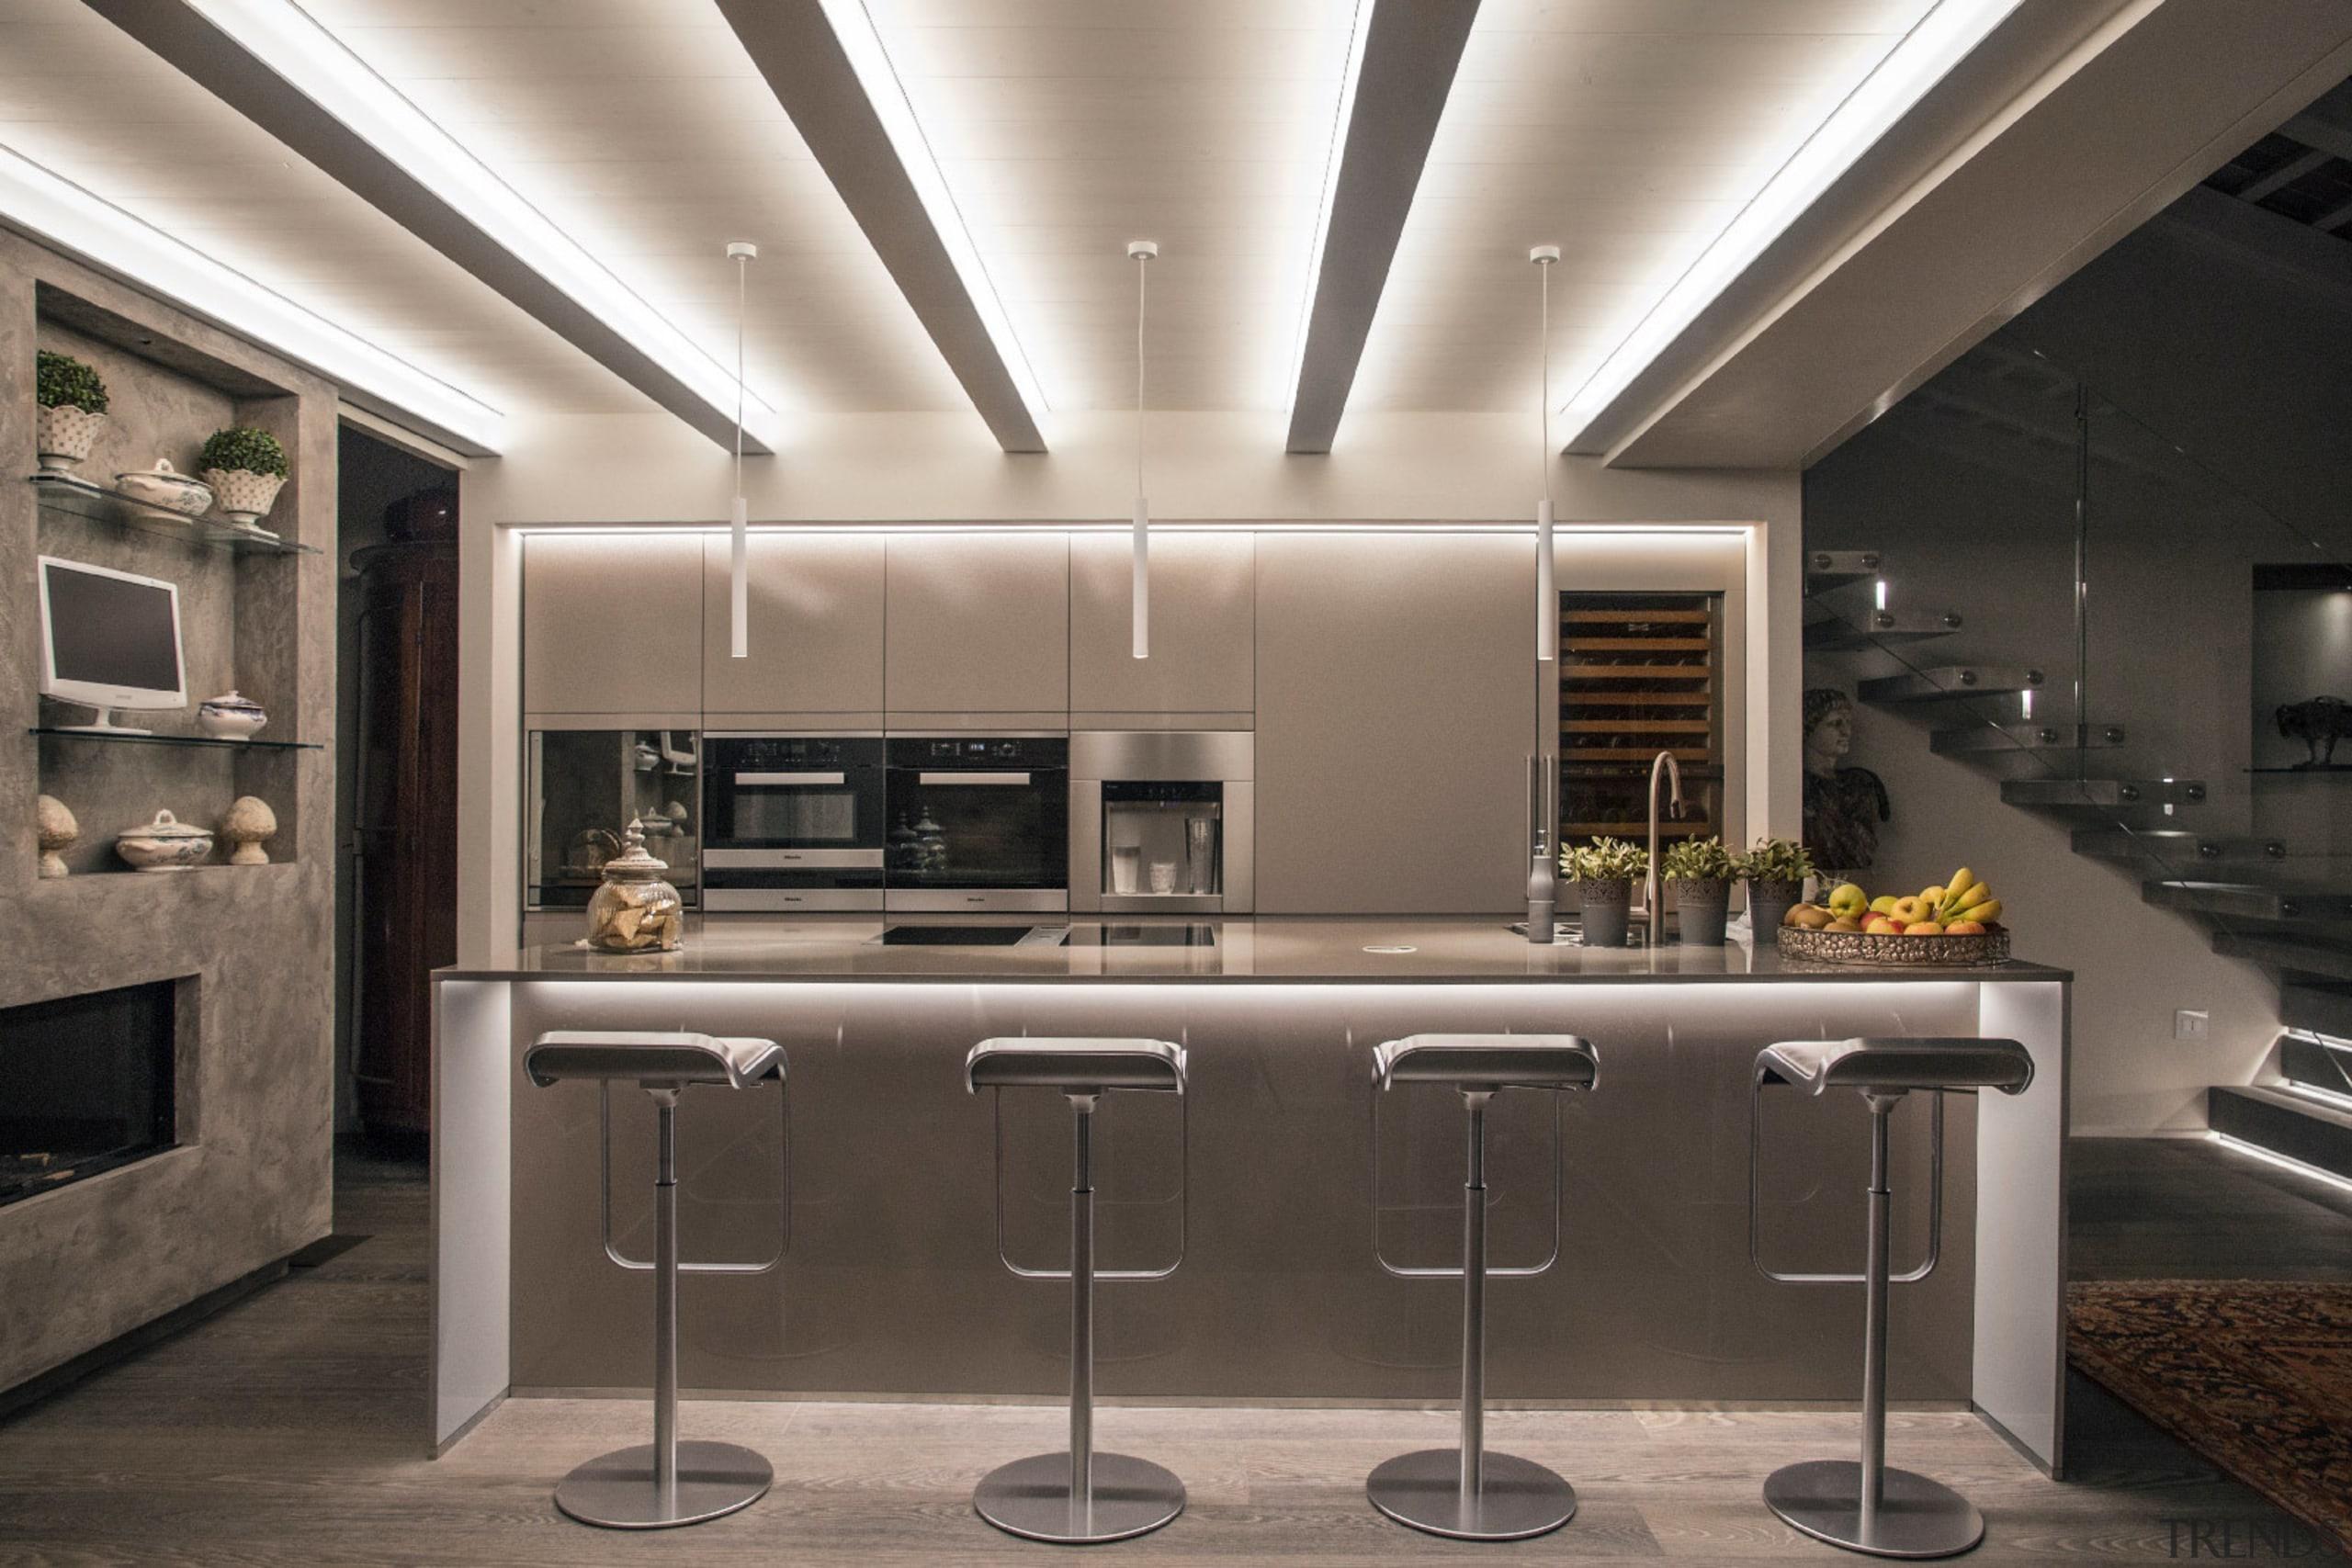 A three pendant lighting arrangement is ideally situated countertop, cuisine classique, interior design, kitchen, gray, black